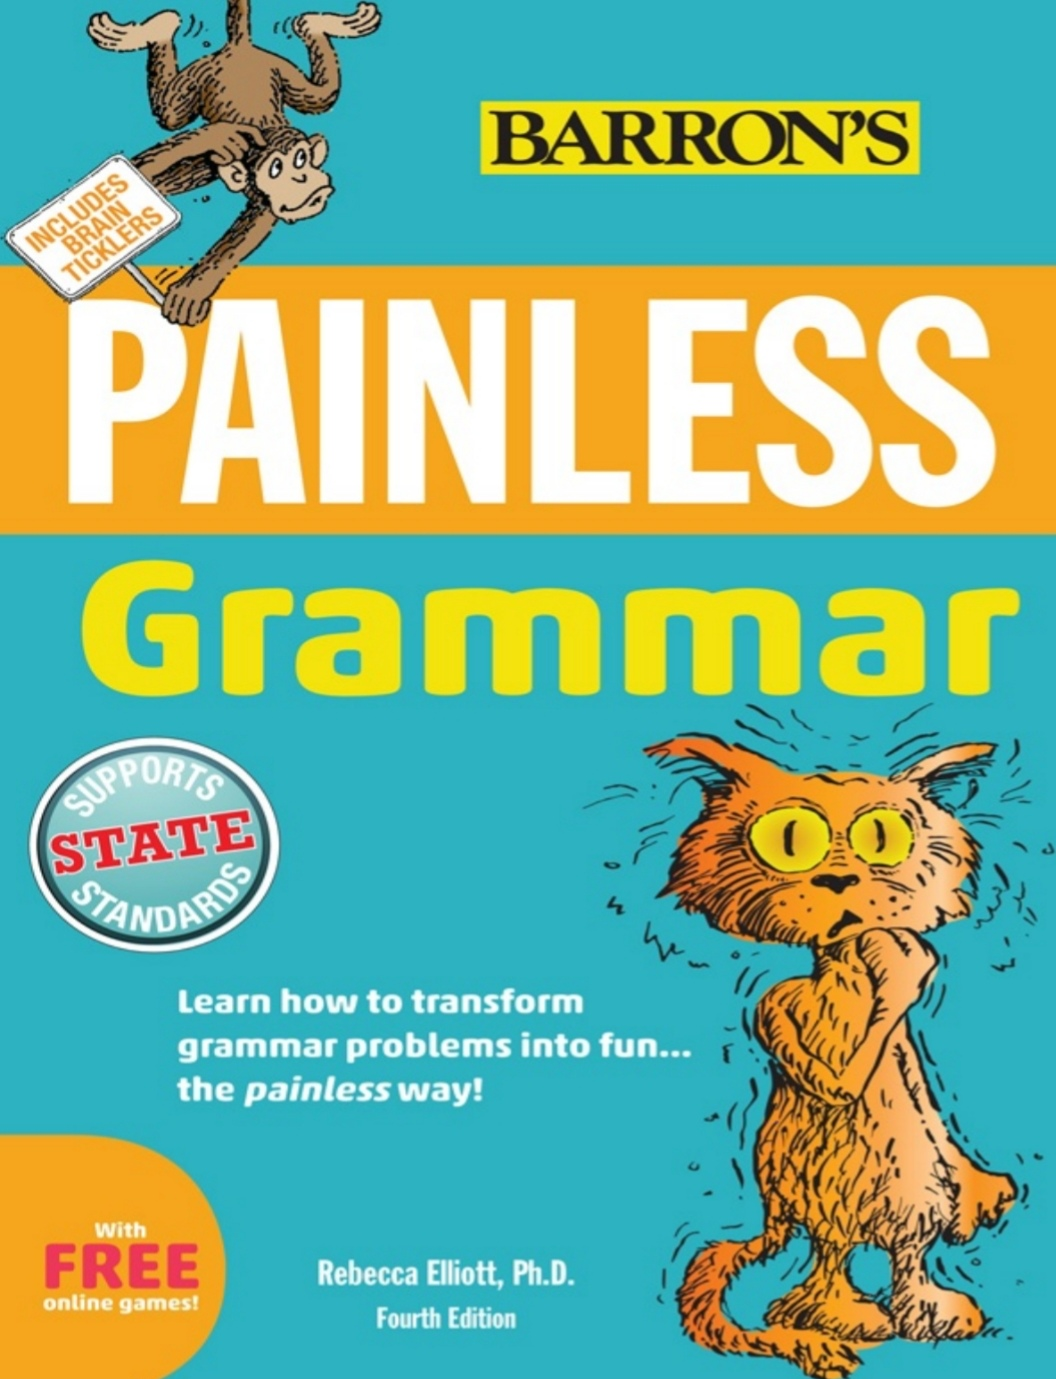 Painless Grammar Fourth Edition